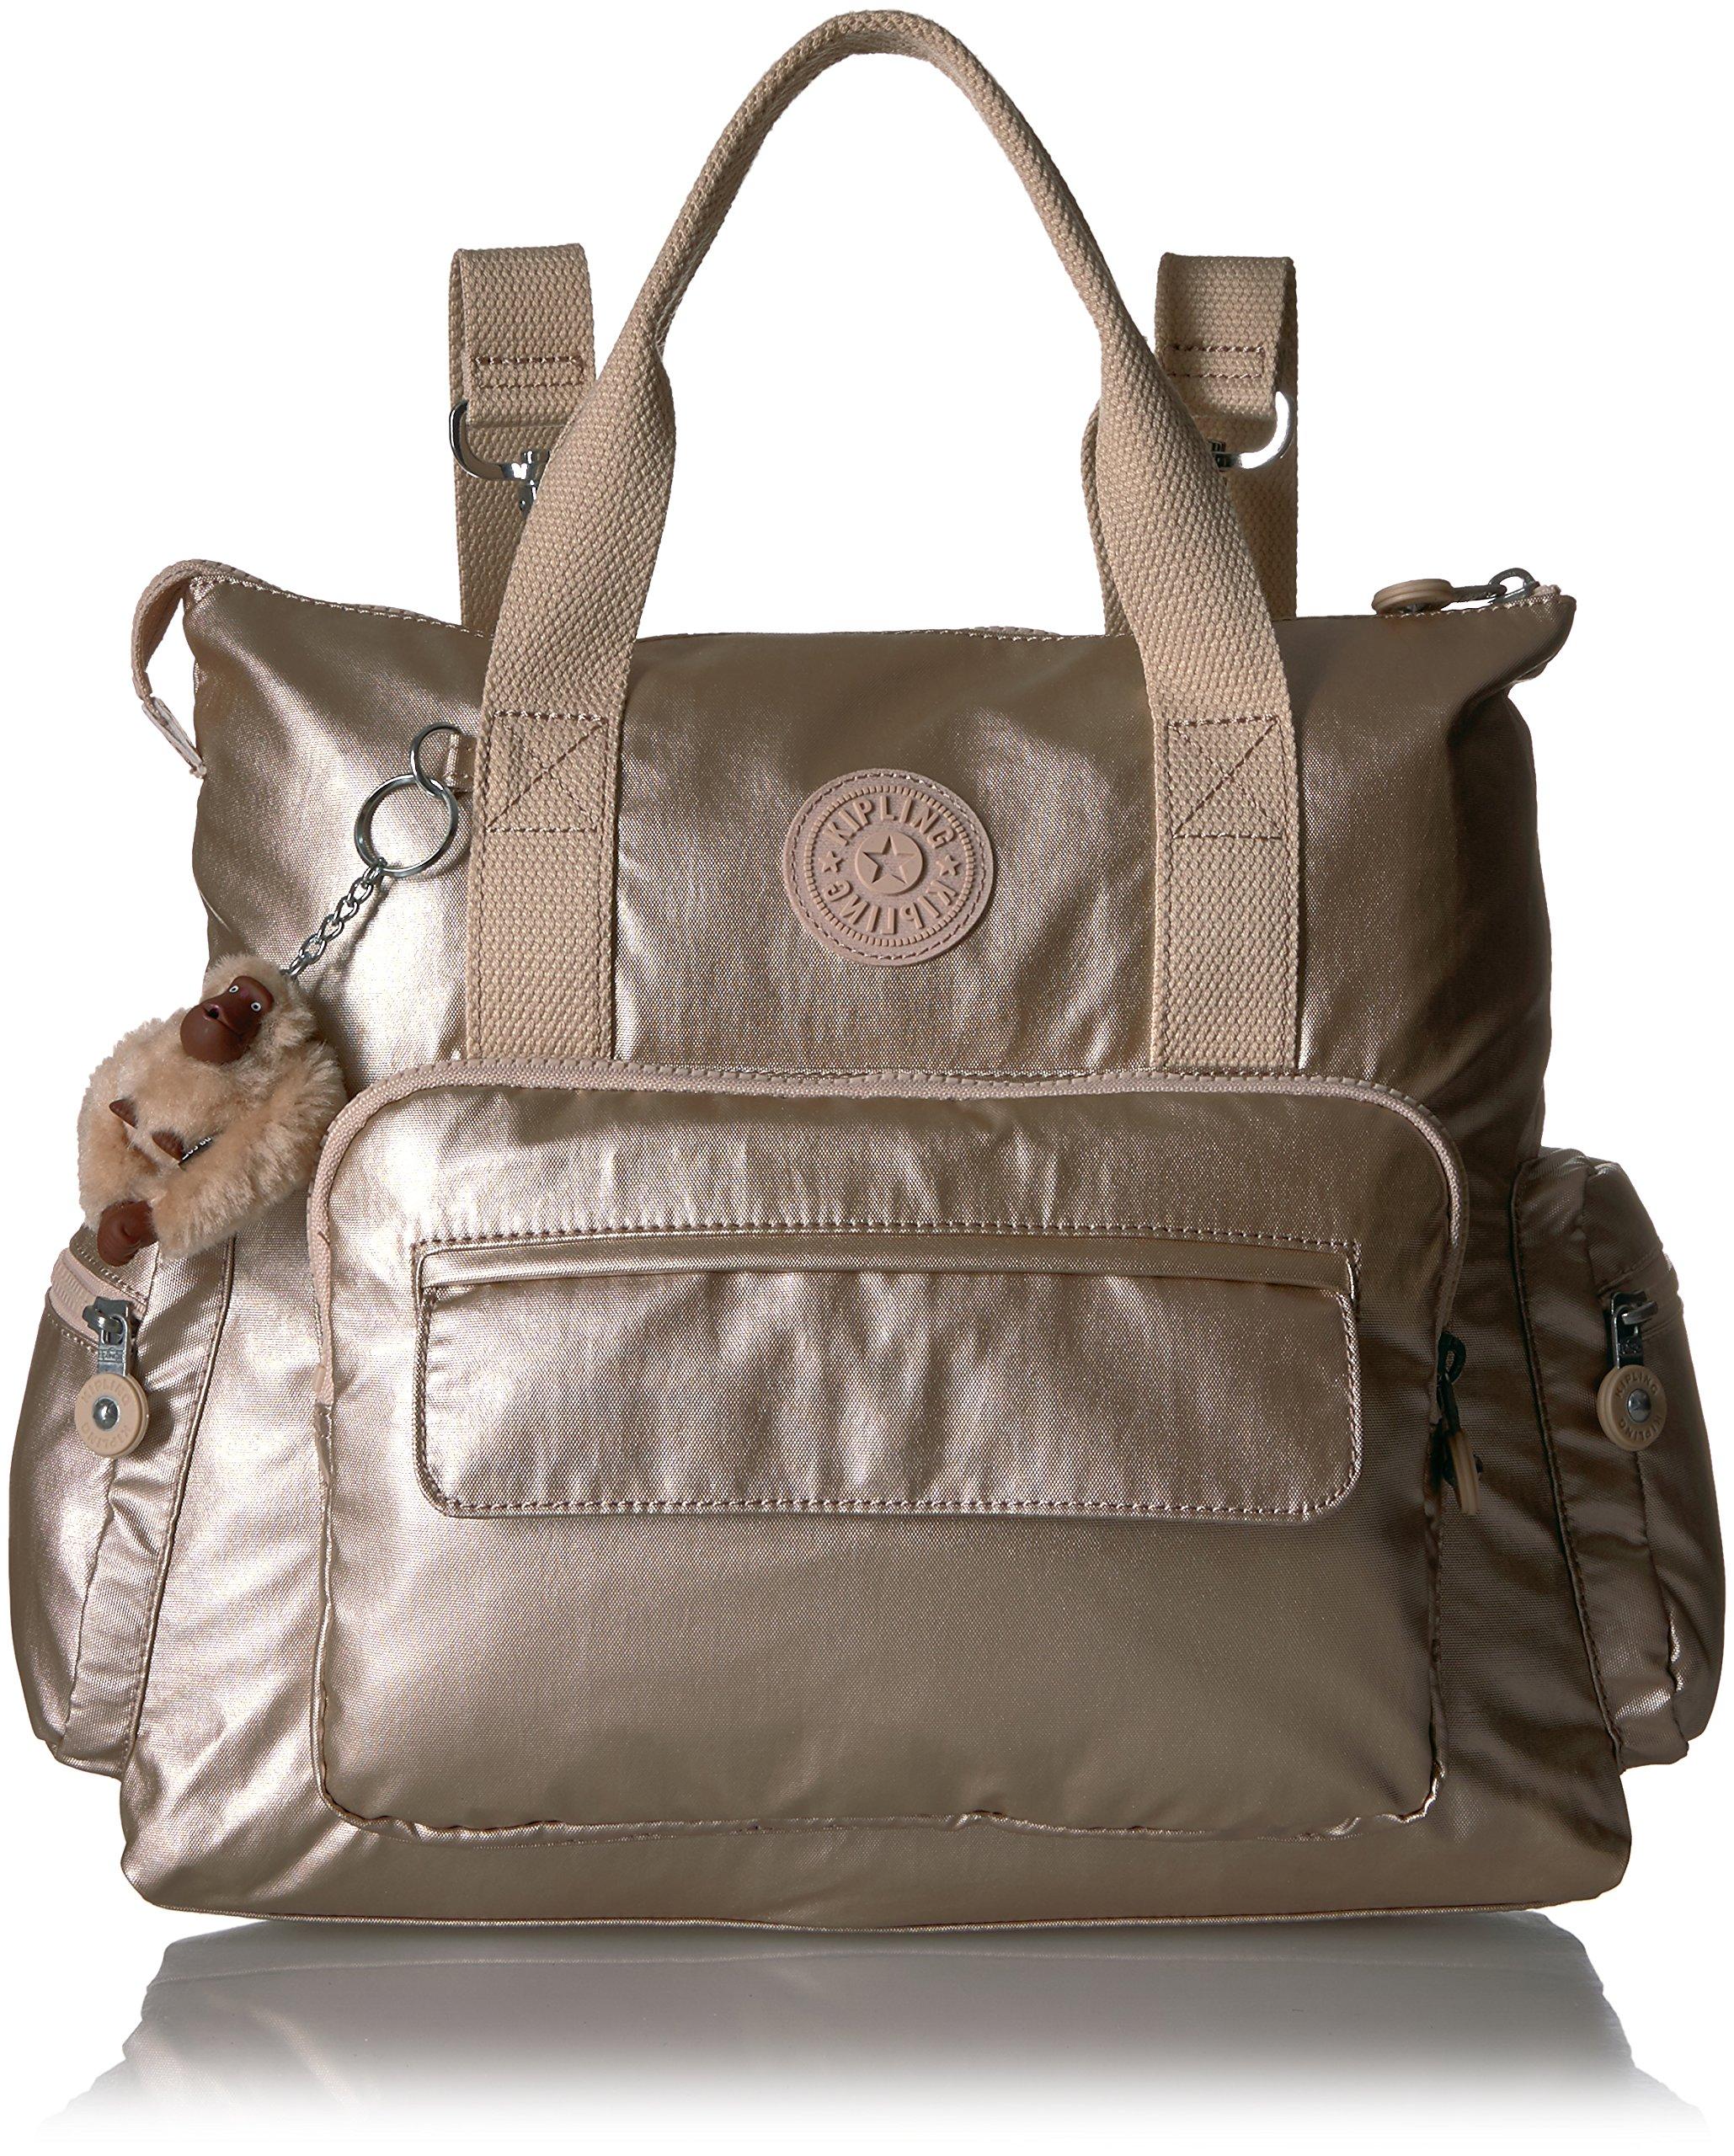 Kipling Alvy Sparkly Gold Convertible Handbag, Sparklygld